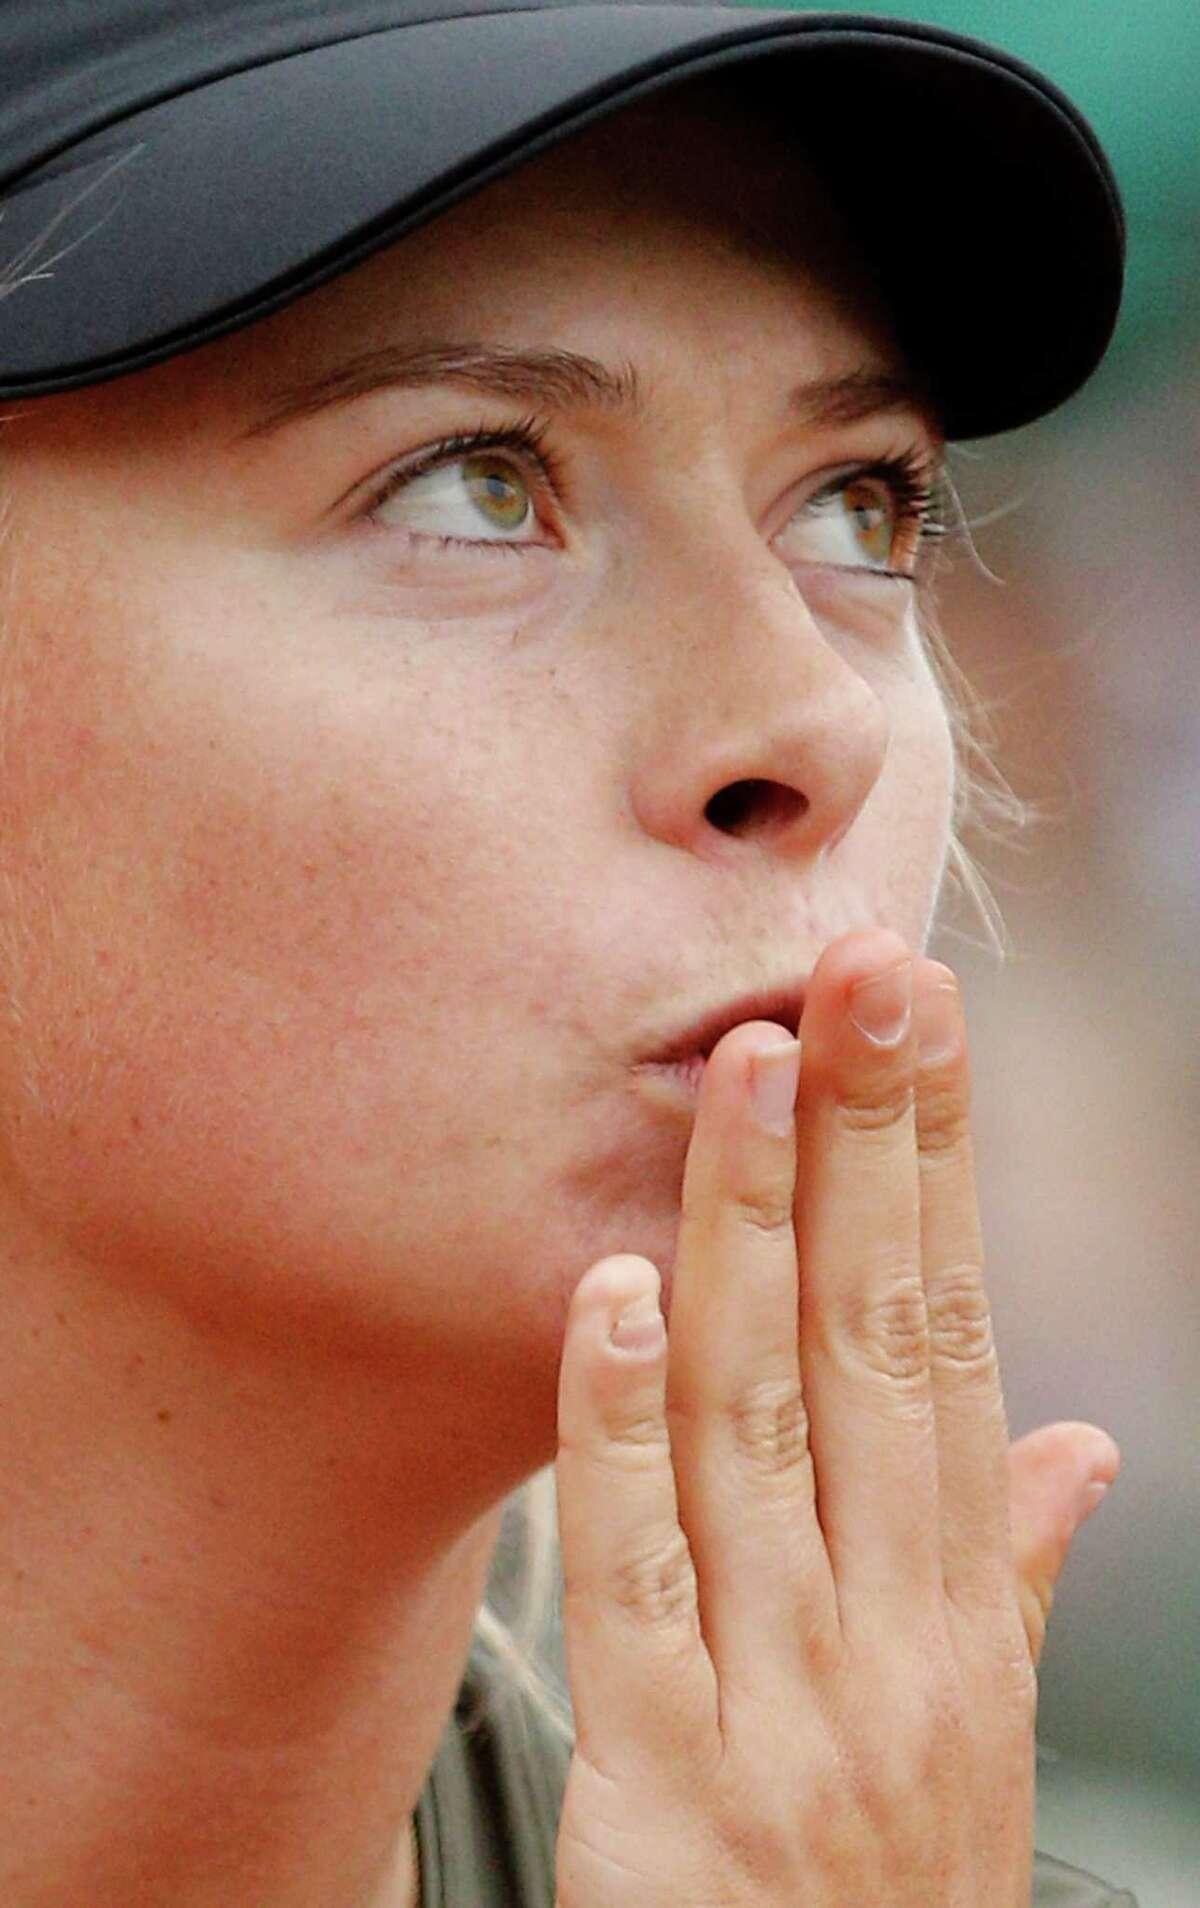 Russia's Maria Sharapova blows a kiss tothe public after defeating Czech Republic's Klara Zakopalova during their fourth round match in the French Open tennis tournament at the Roland Garros stadium in Paris, Monday, June 4, 2012. Sharapova won 6-4, 6-7, 6-2. (AP Photo/Christophe Ena)